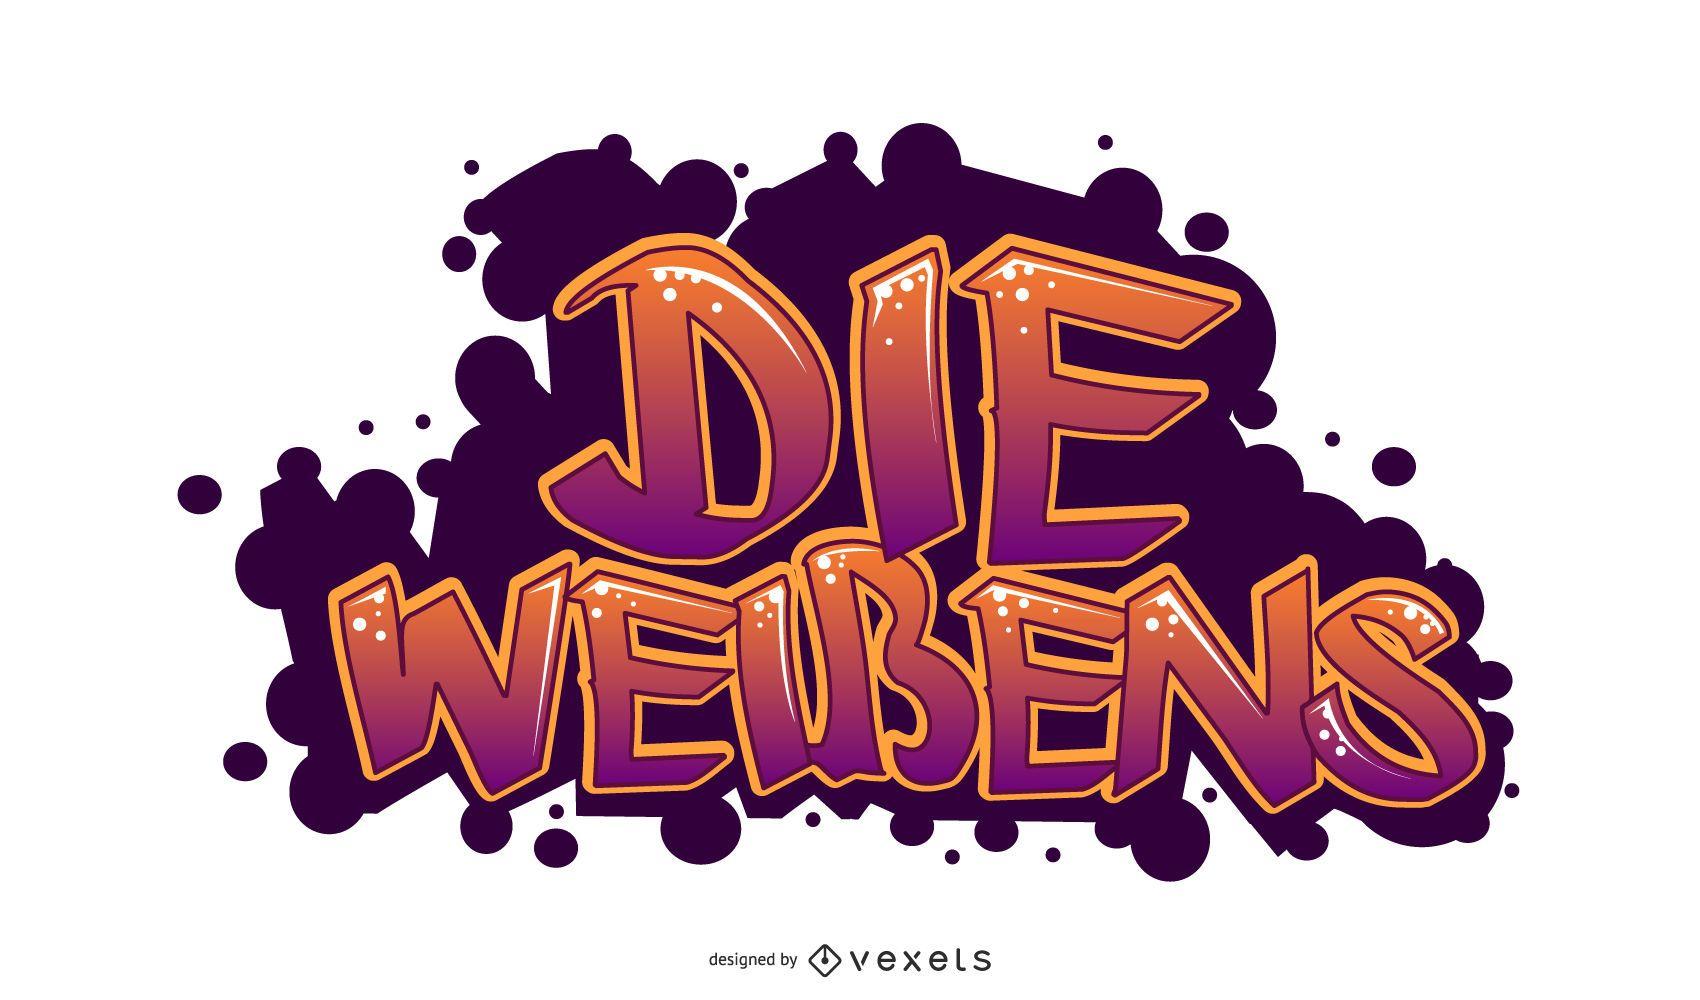 Street Art German Lettering Design